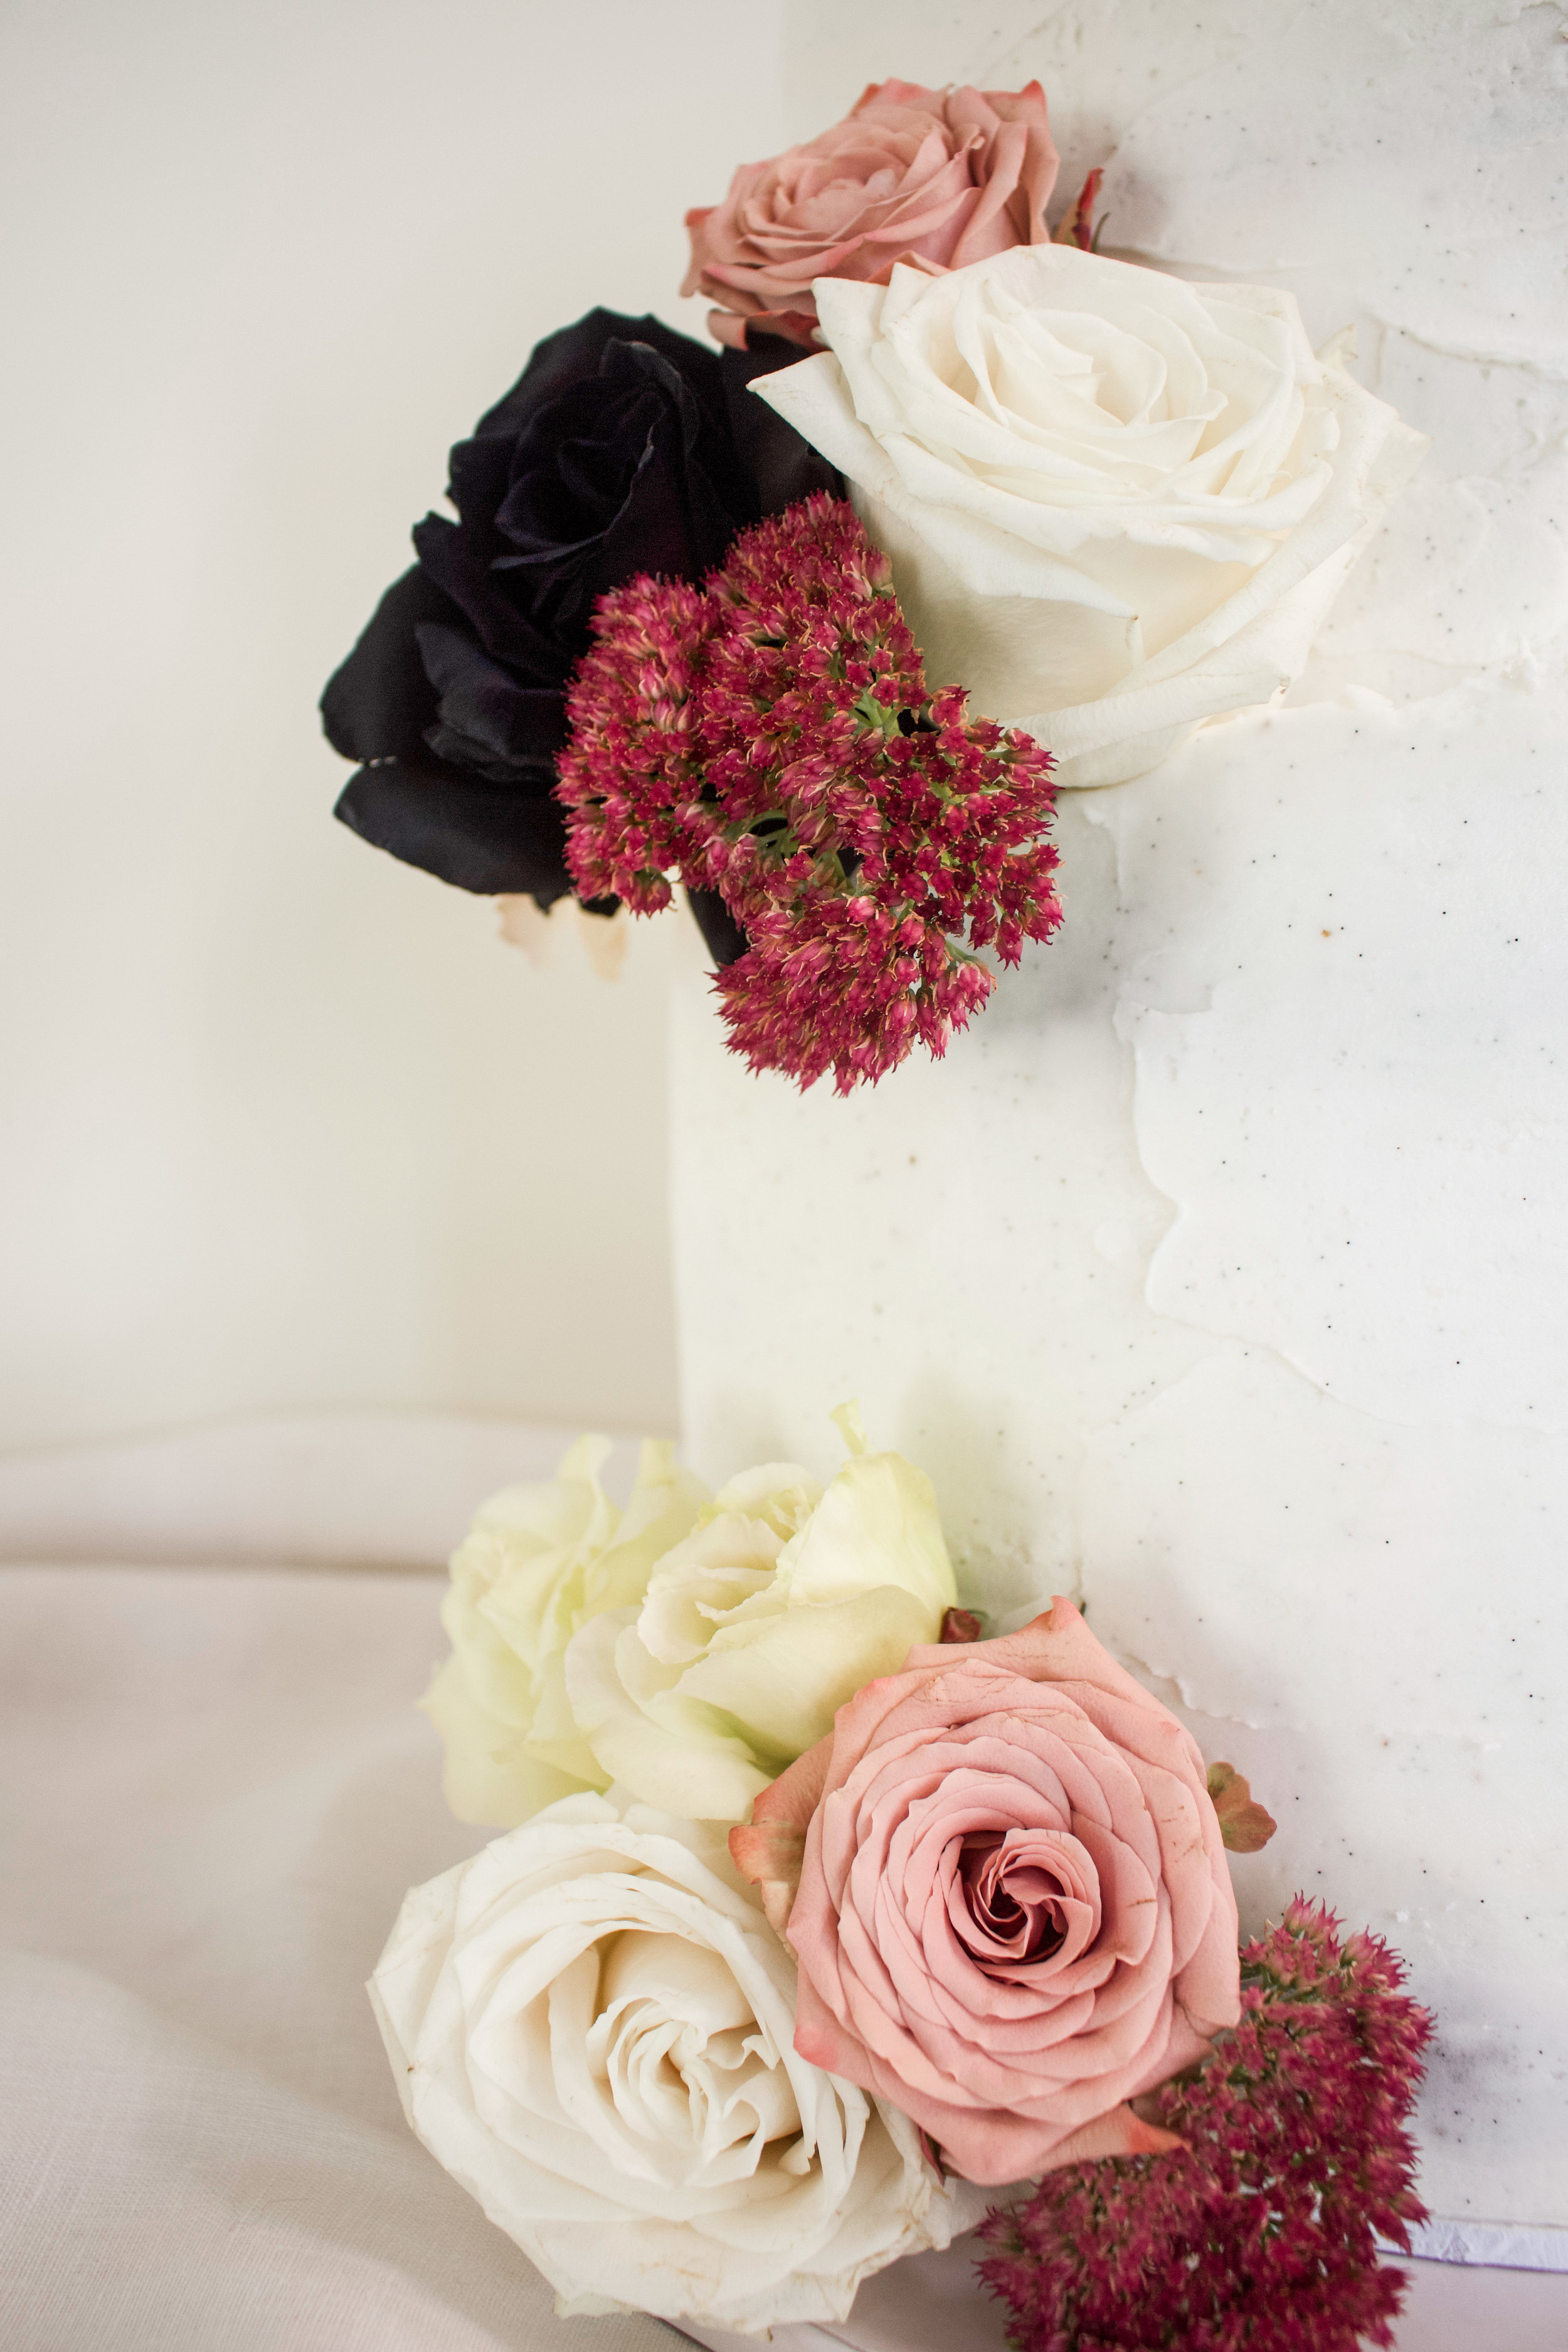 < wedding cake details >